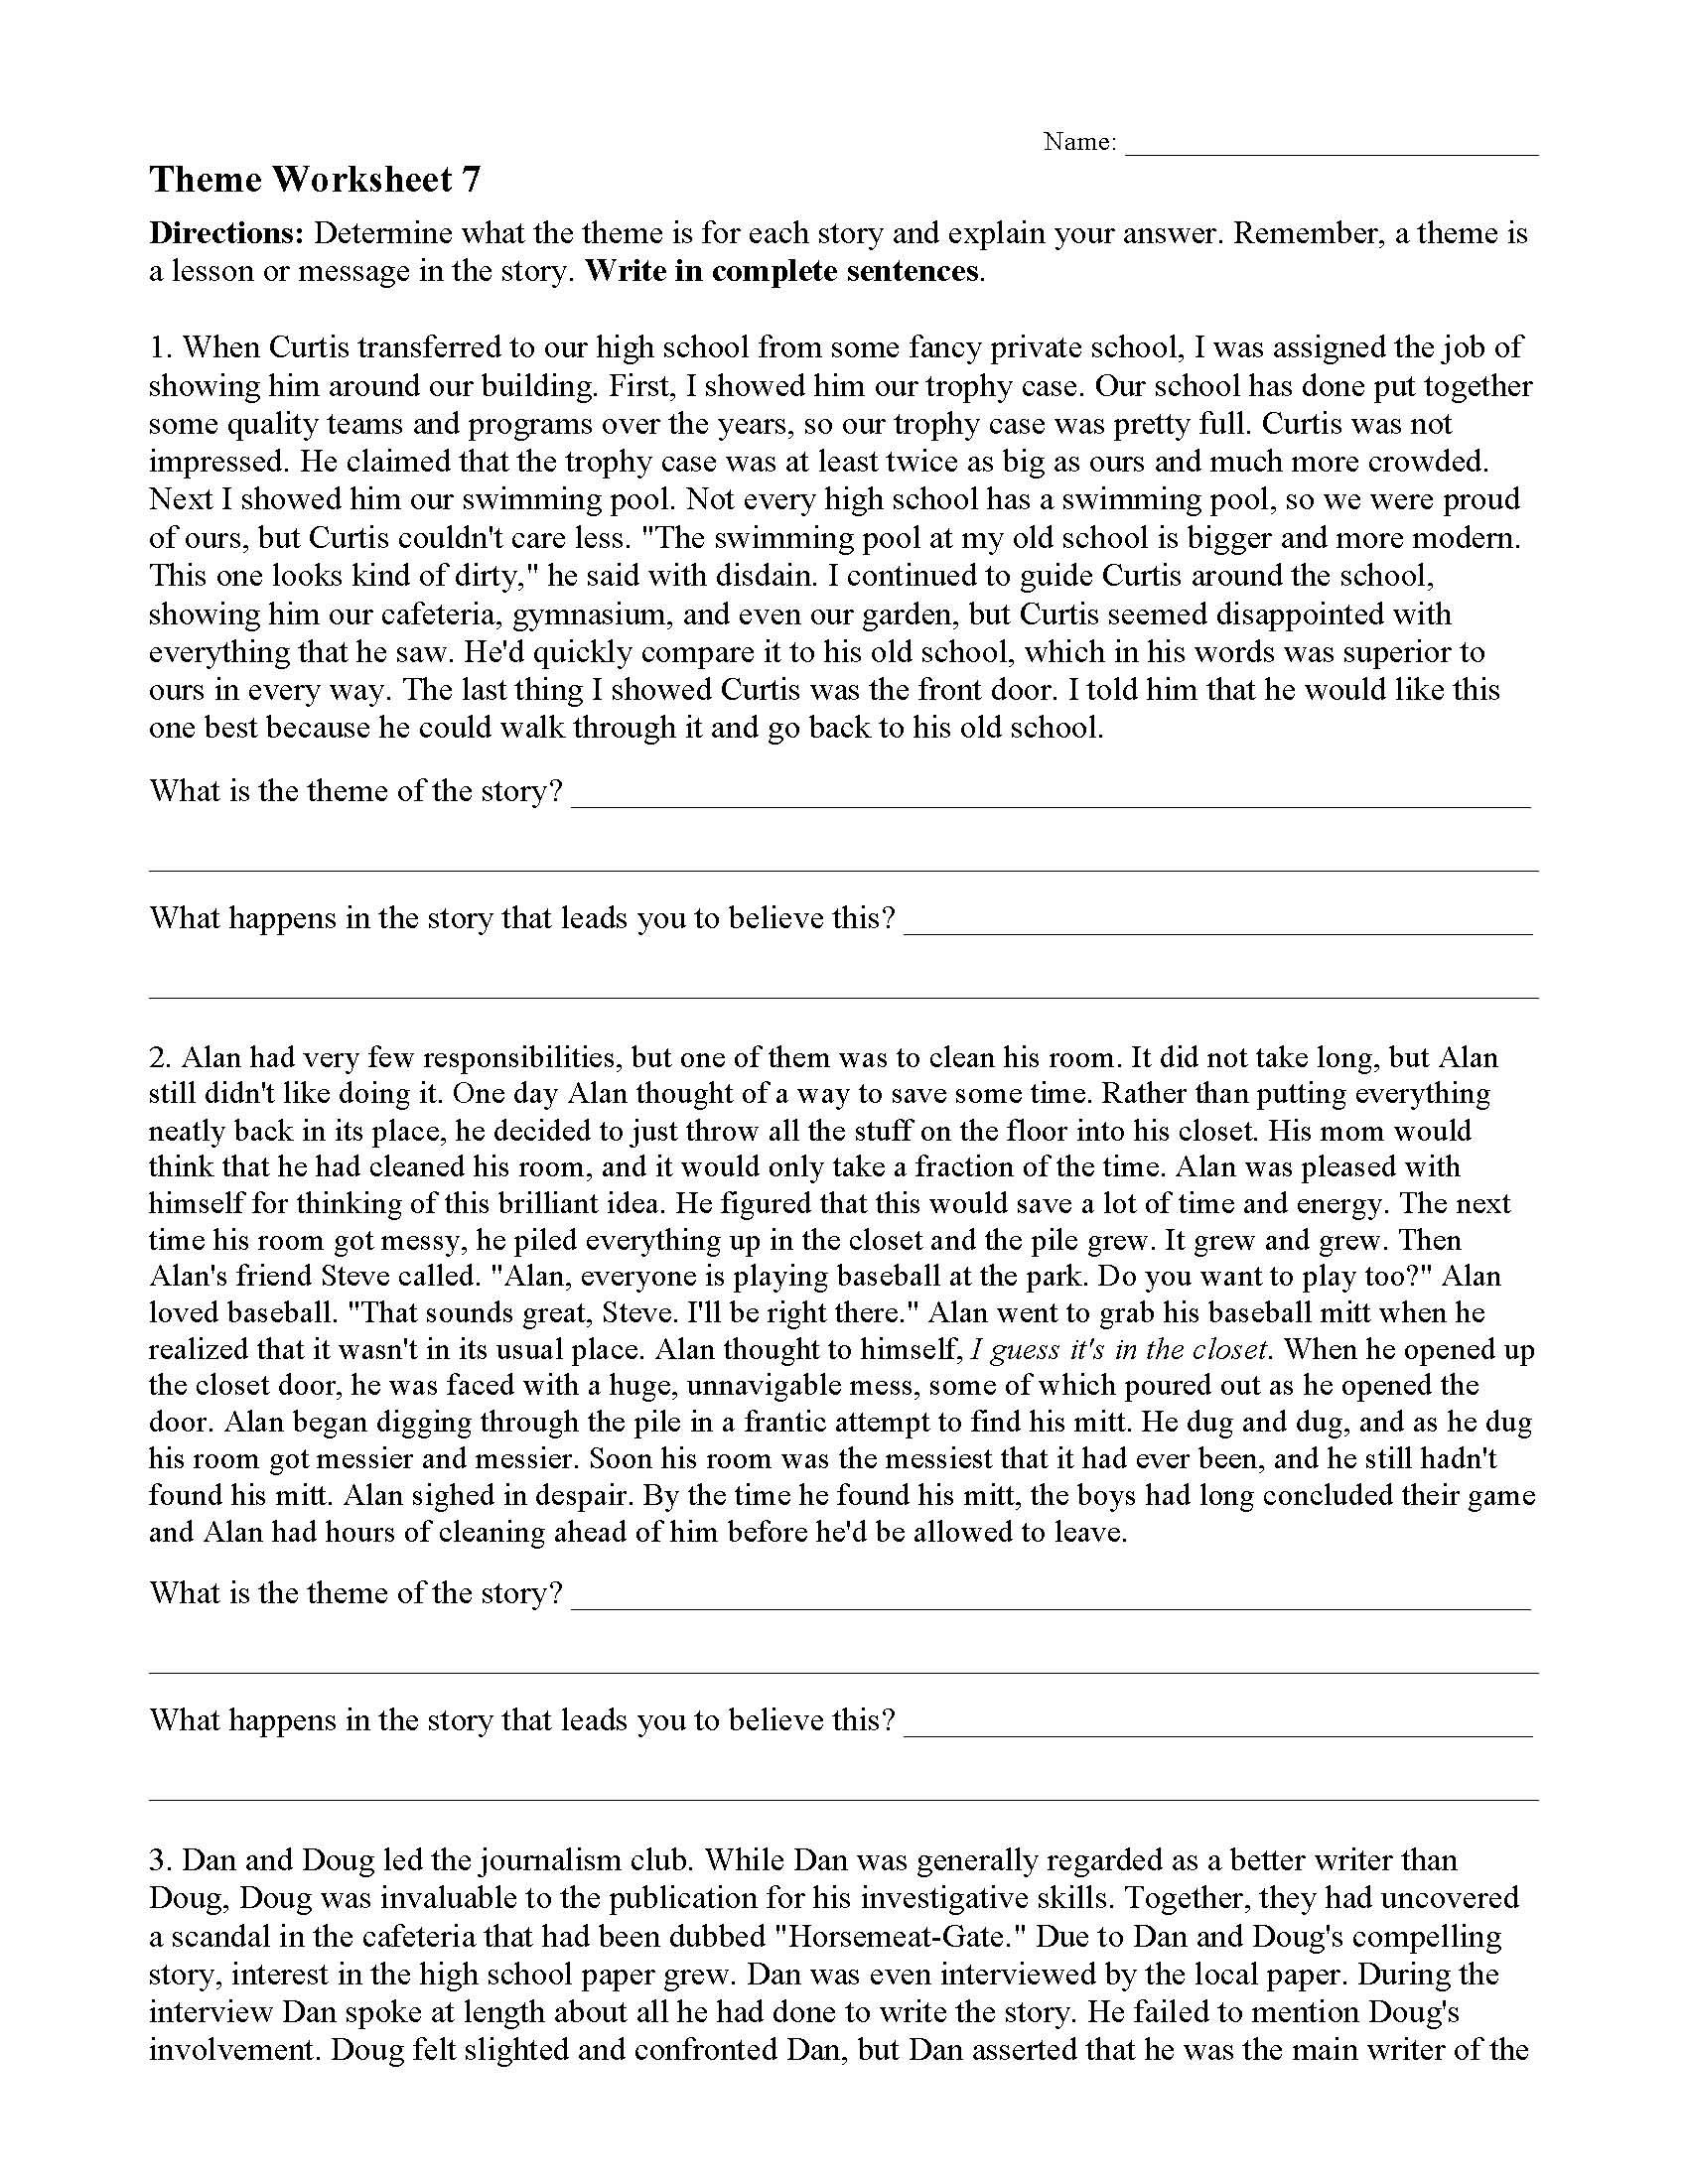 Theme Worksheet 7